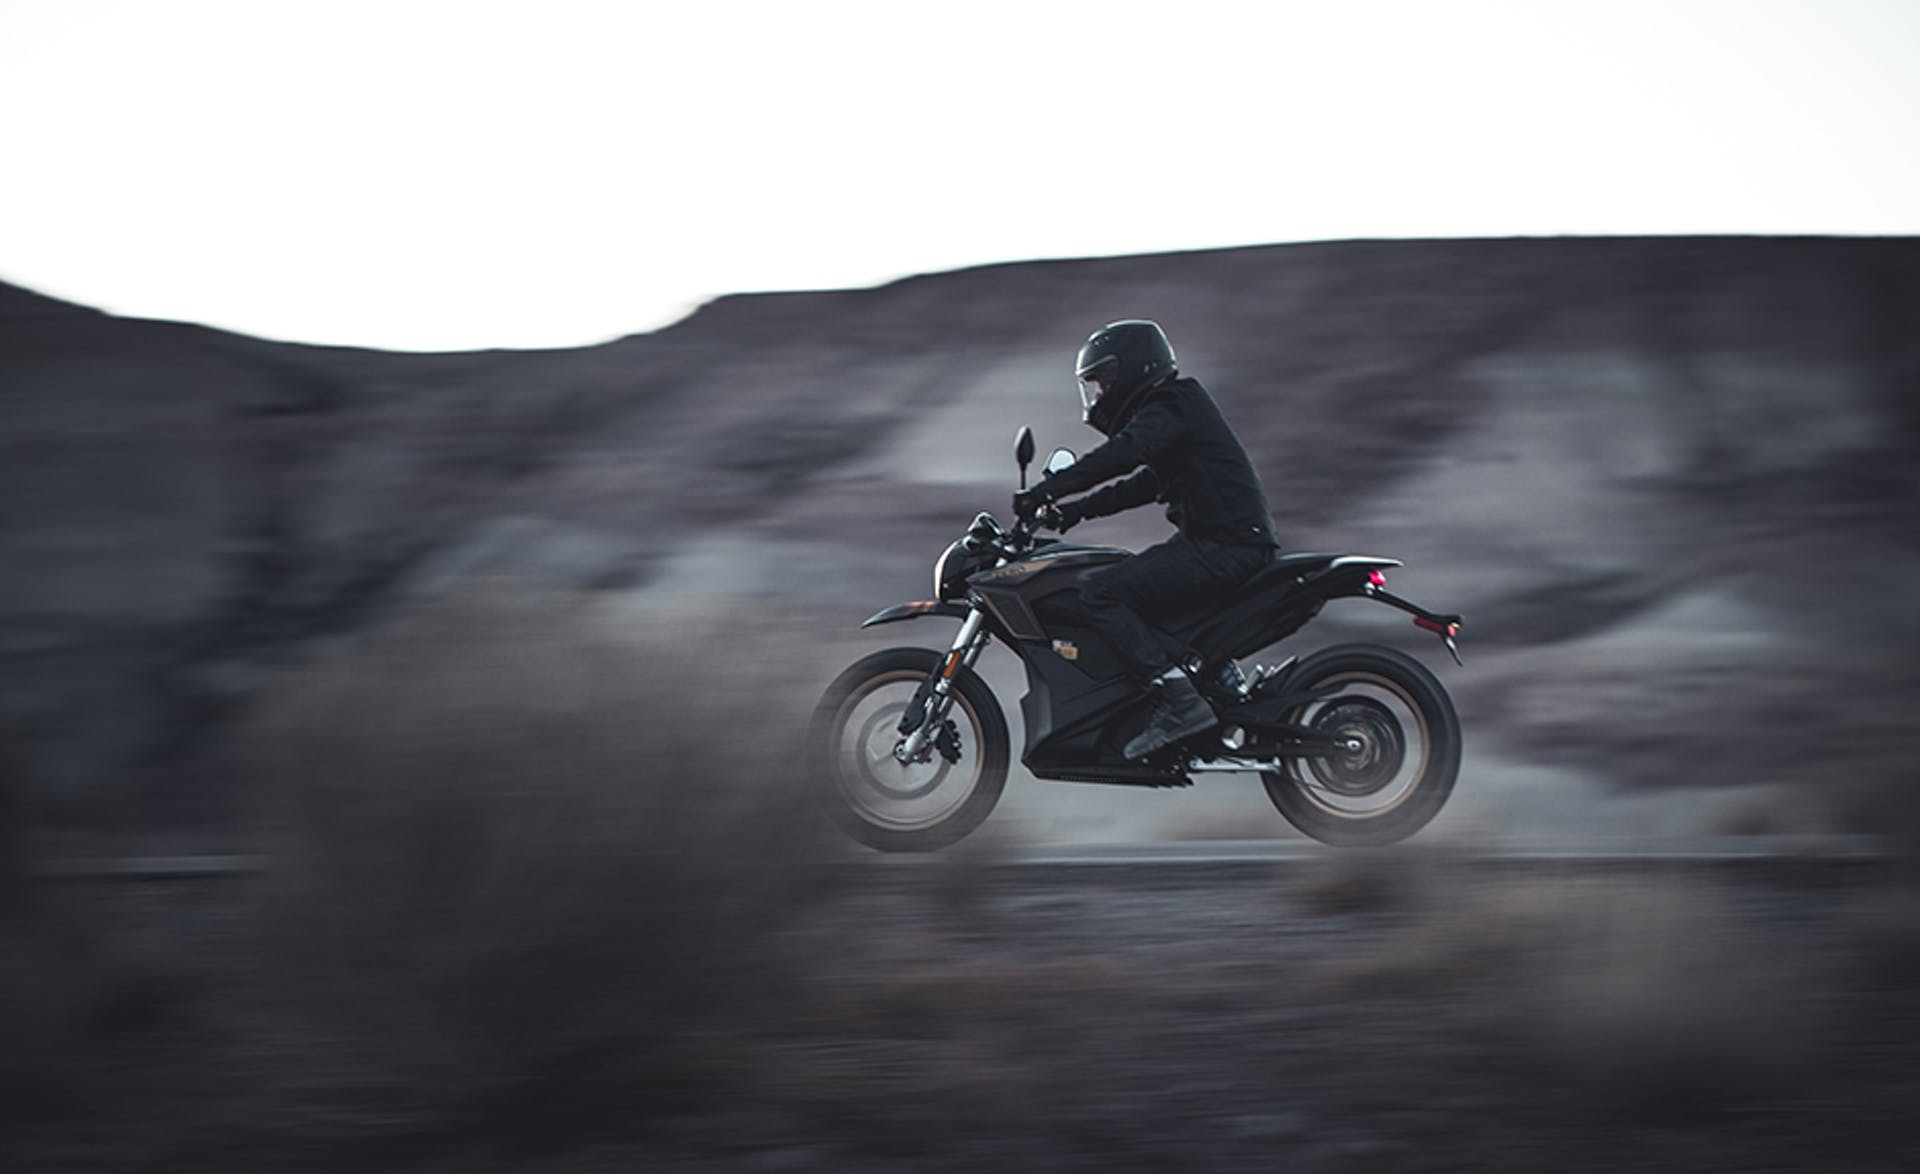 2021 Zero Motorcycle DSR